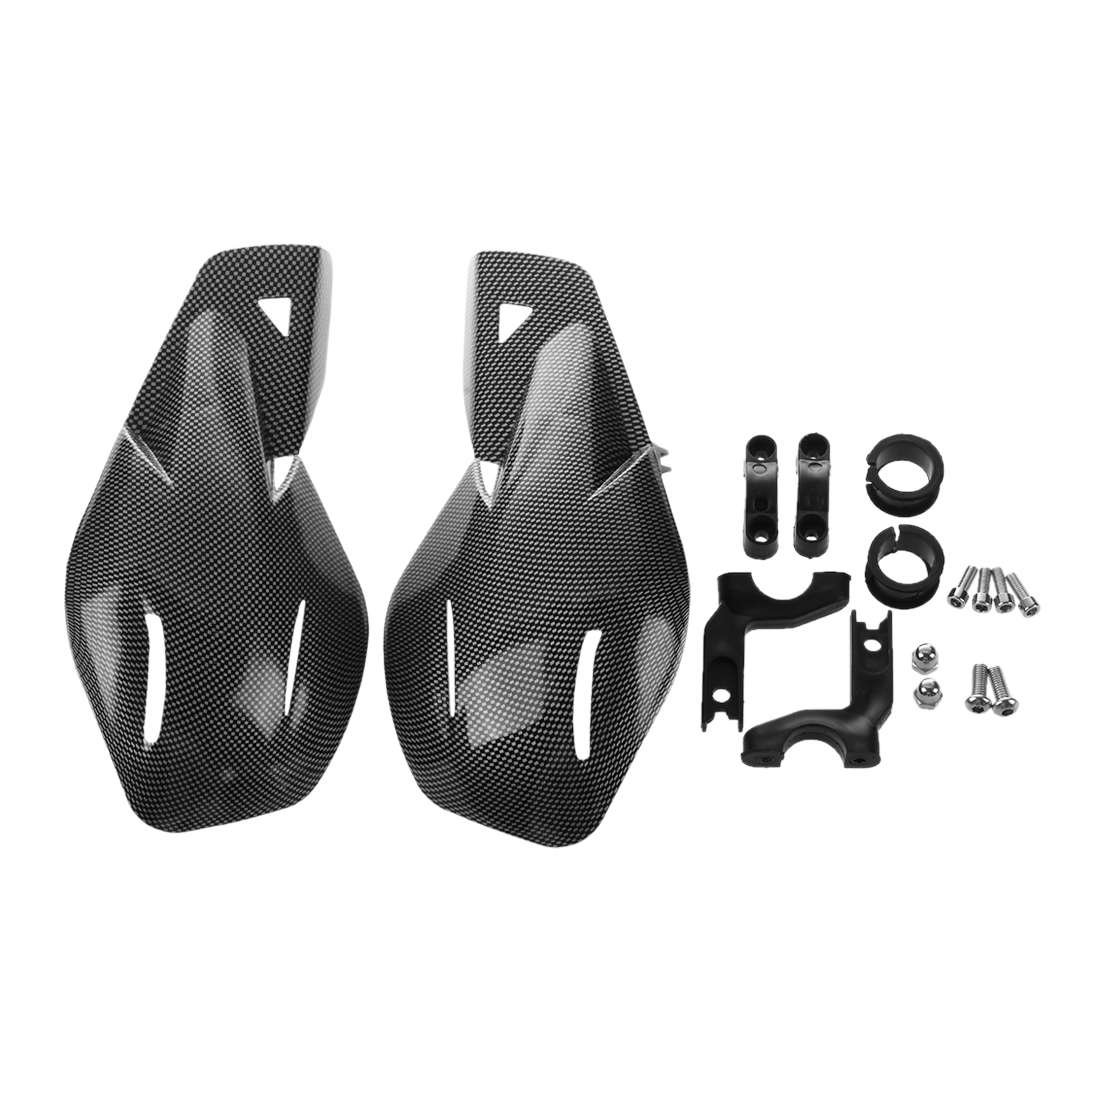 TOOGOO 1 Paire 22mm Garde-Mains Menottes Guidon Universel Moto en Fibre De Carbone